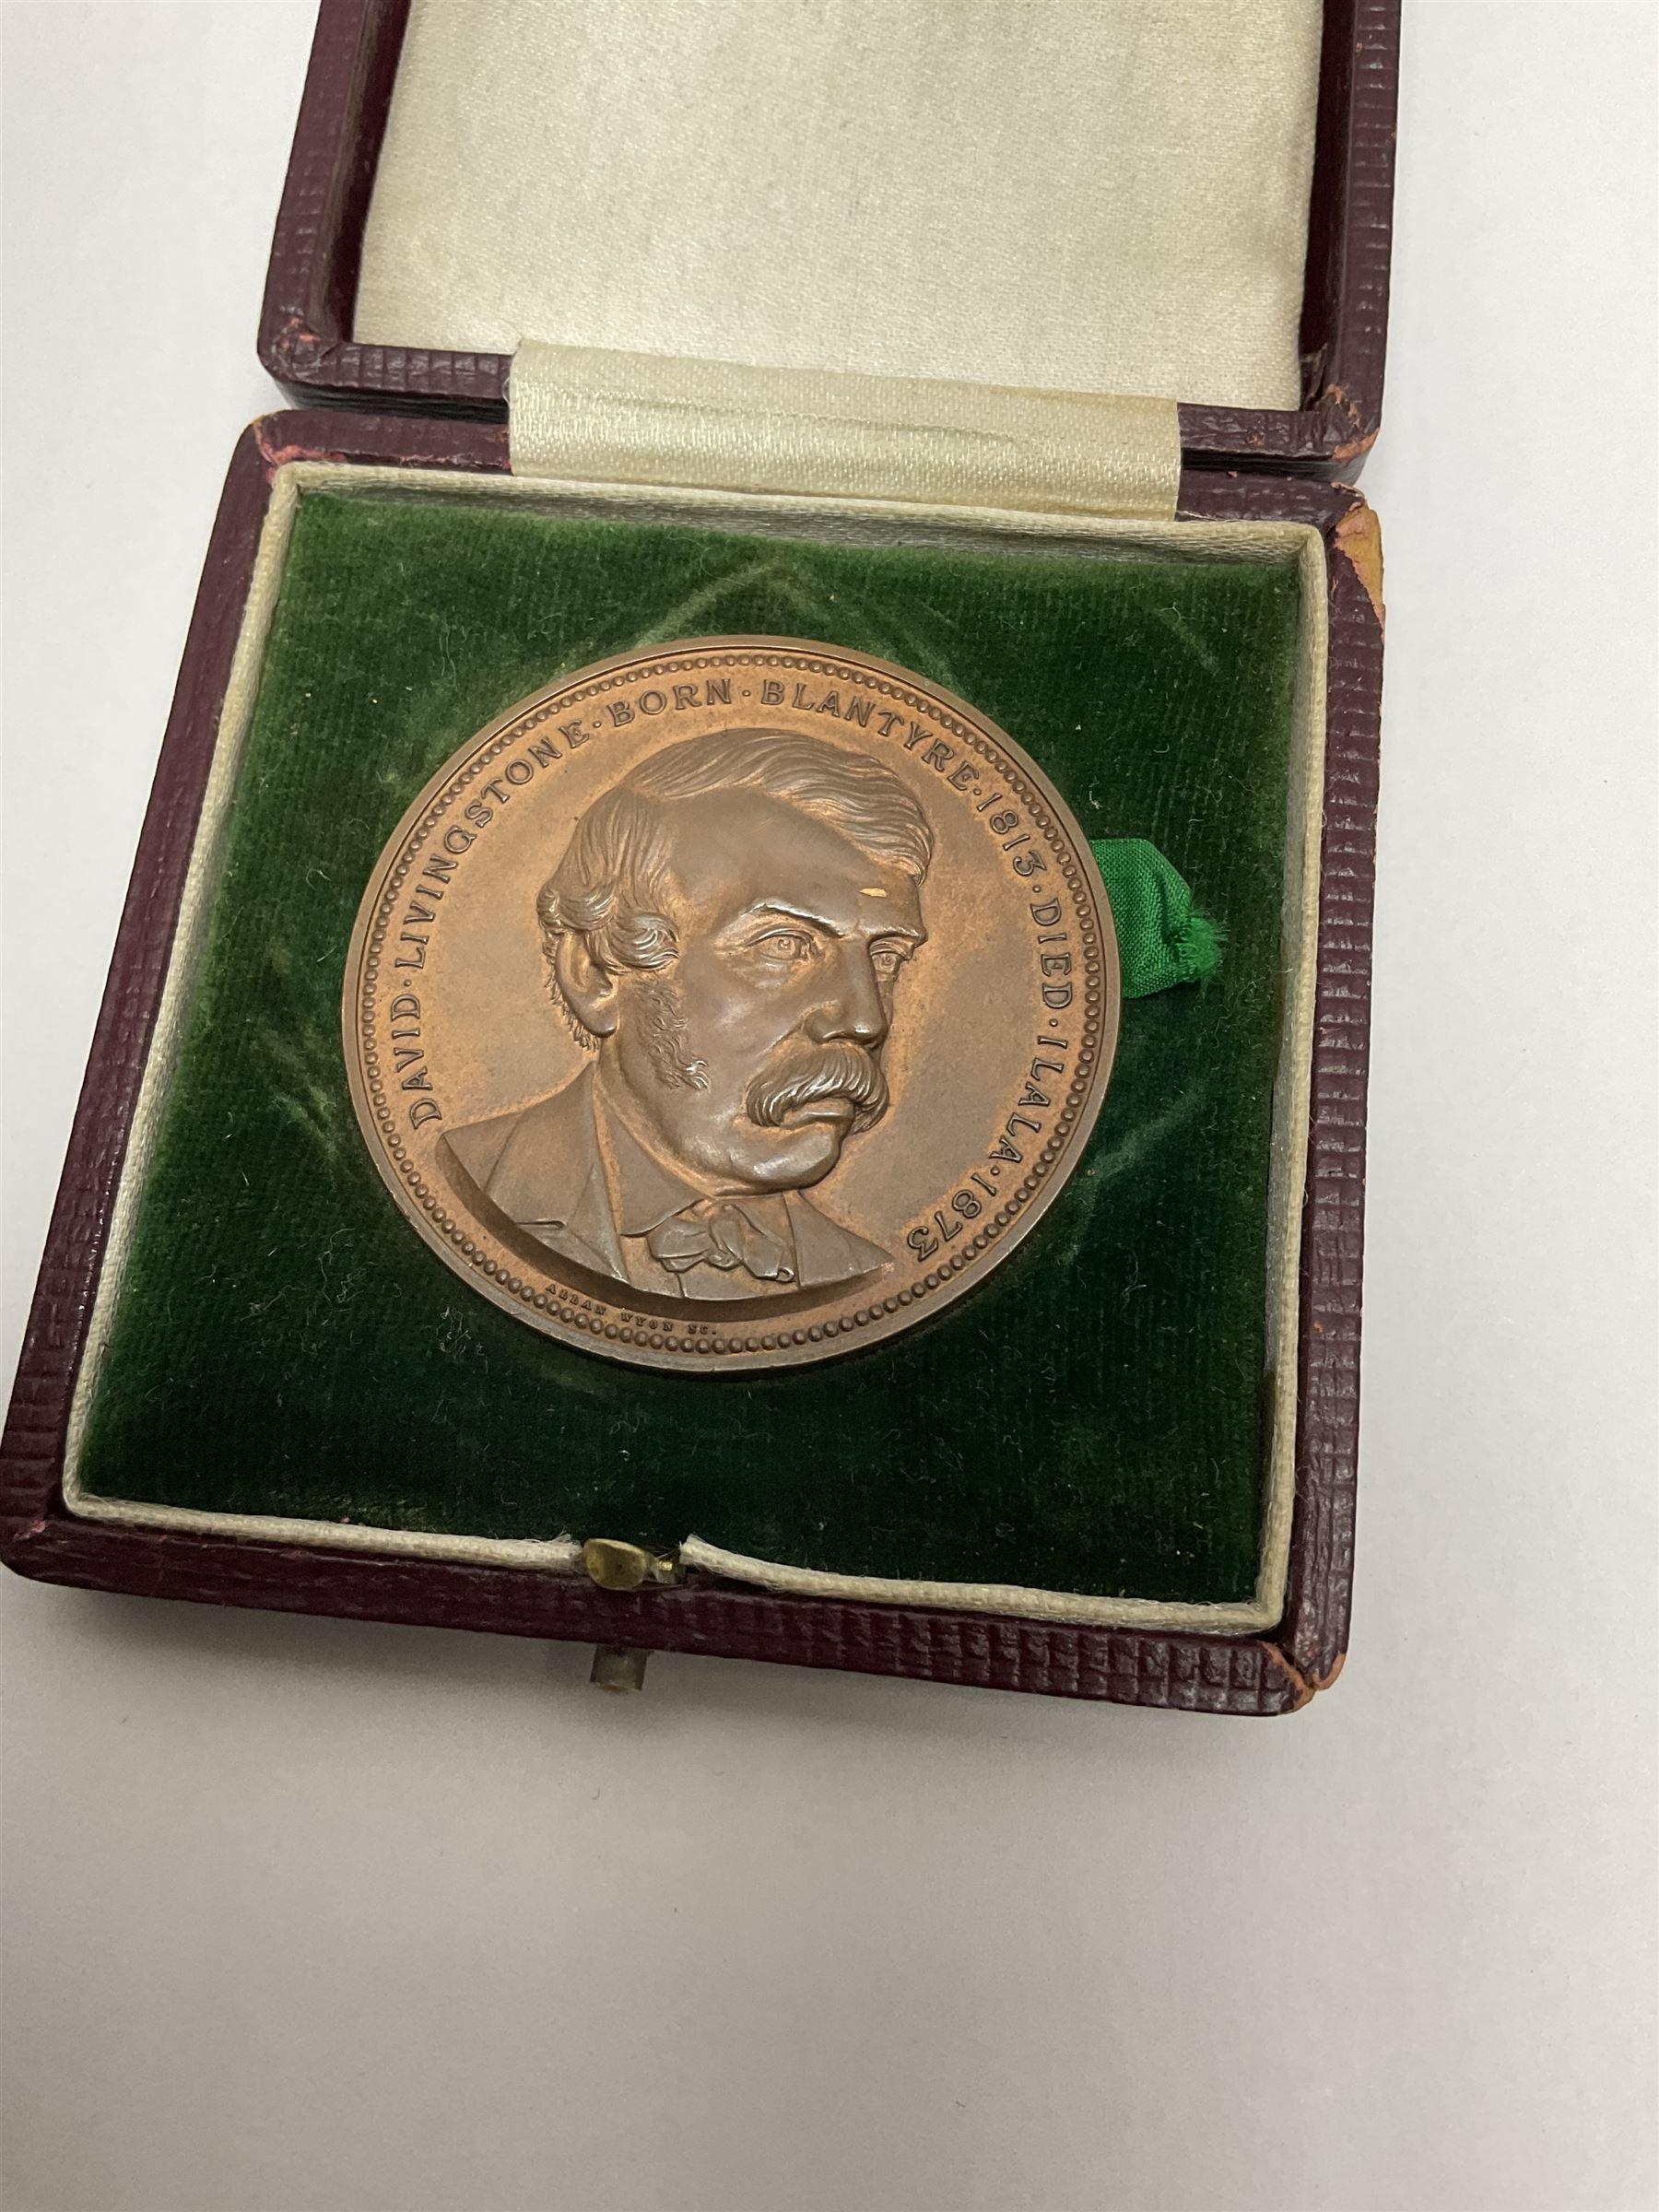 David Livingstone (1813-1873) commemorative medallion celebrating the Centenary of his birth - Image 2 of 4